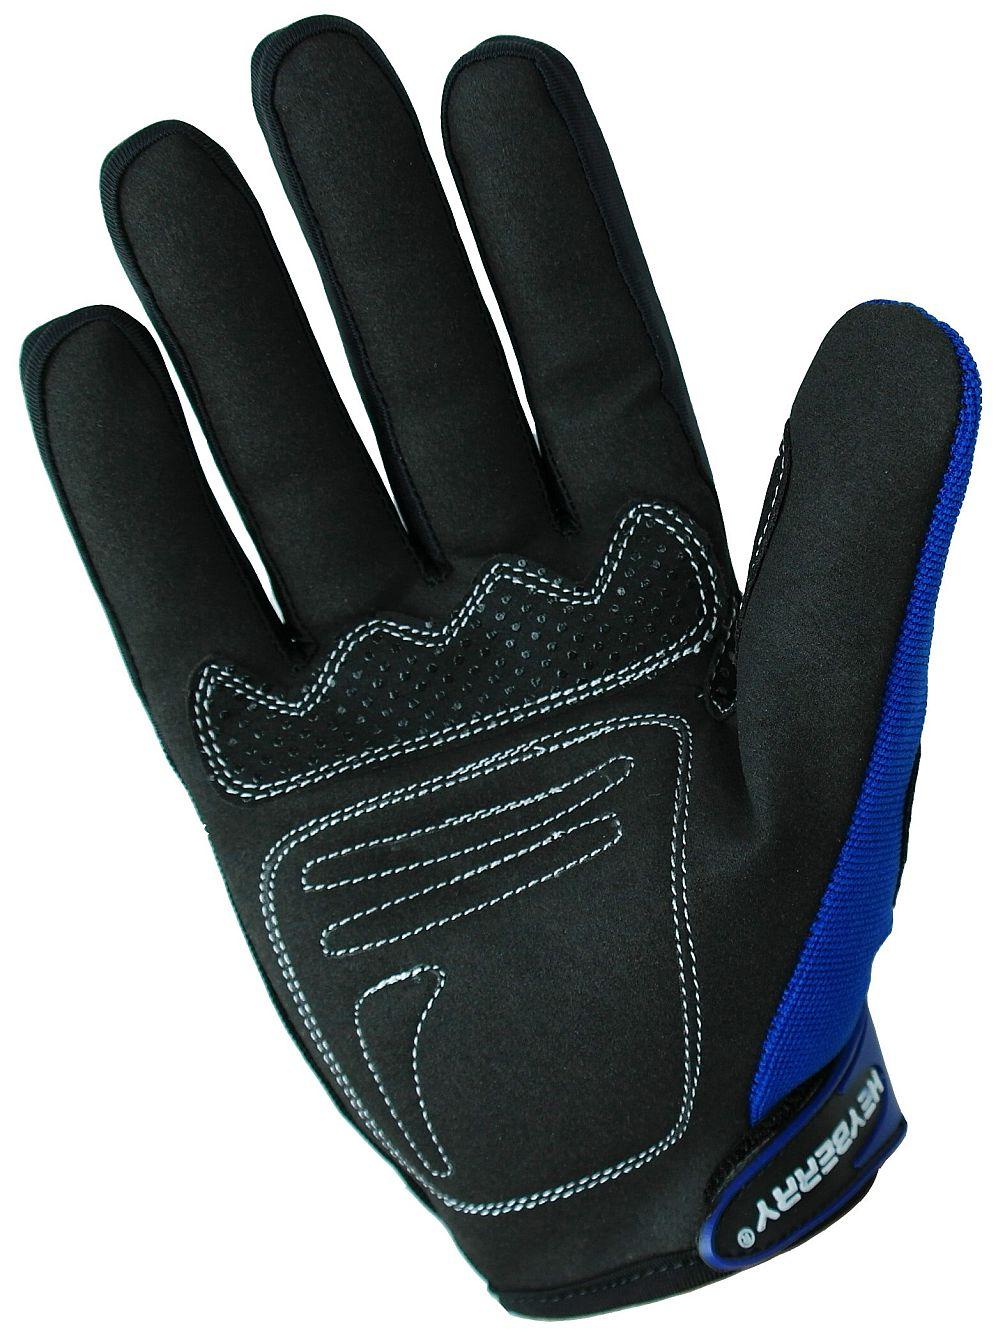 Heyberry Motocross MTB MX Handschuhe schwarz blau Gr. S - XXL